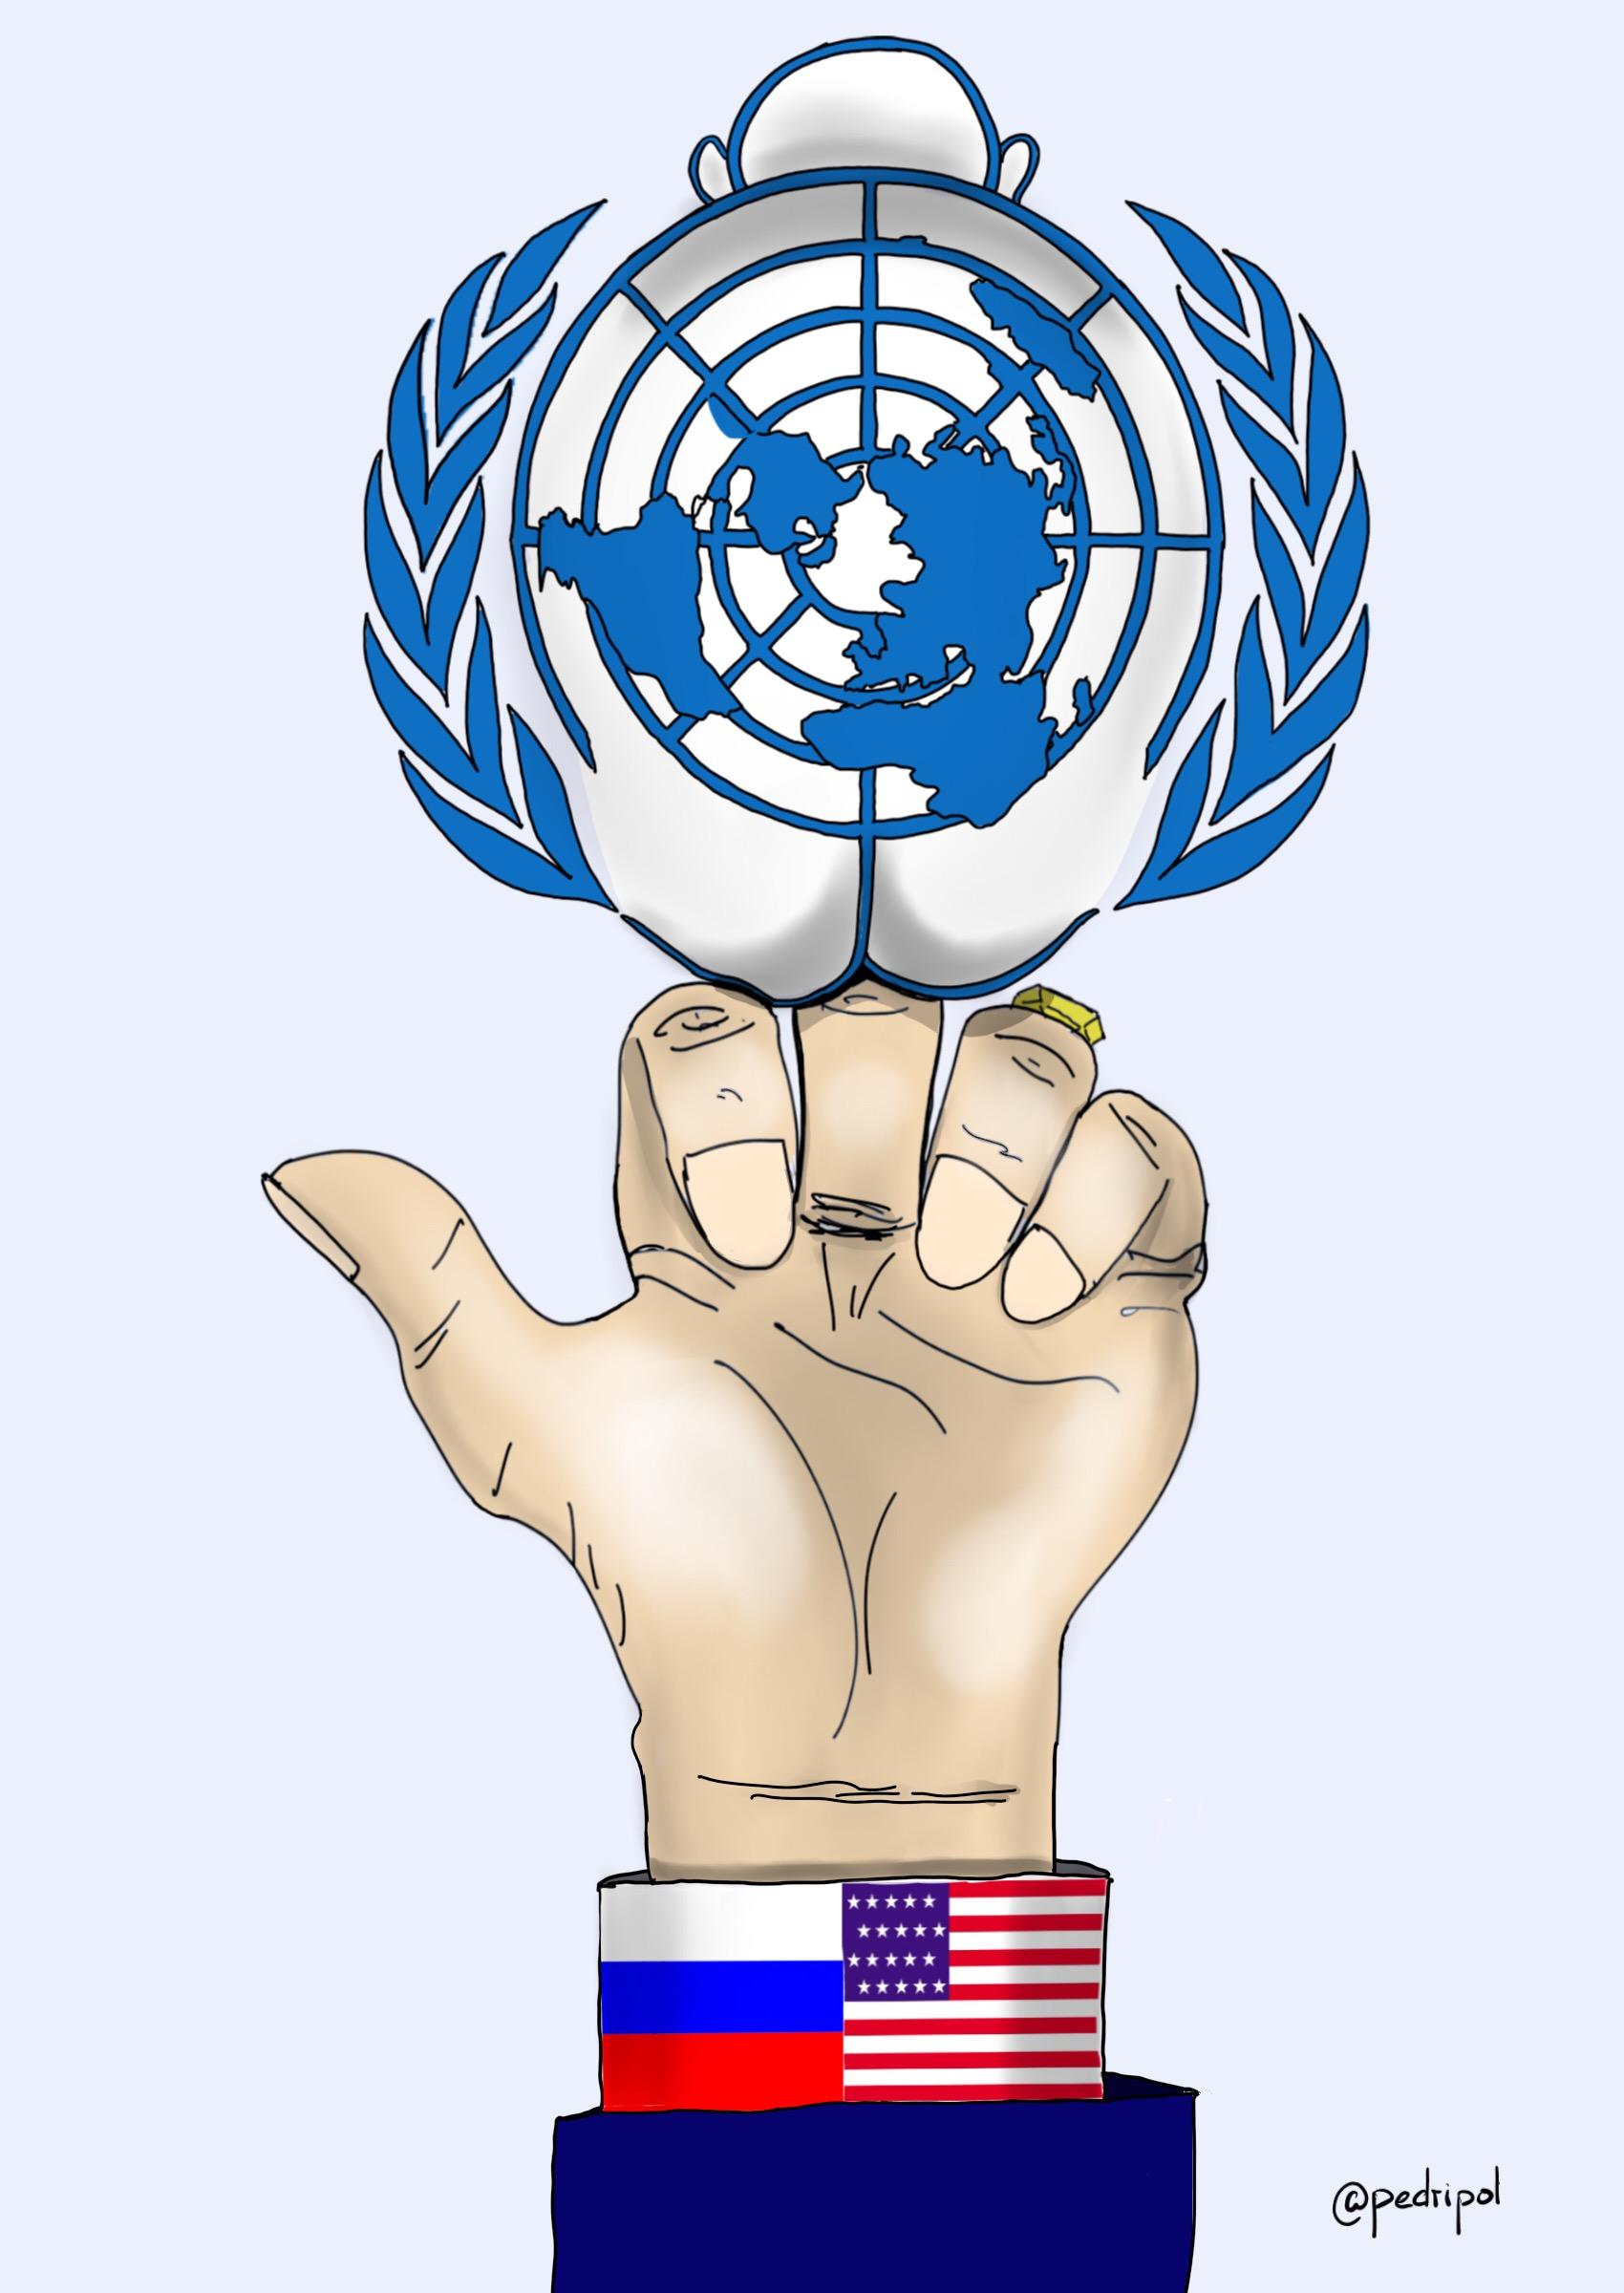 la ONU está jodida